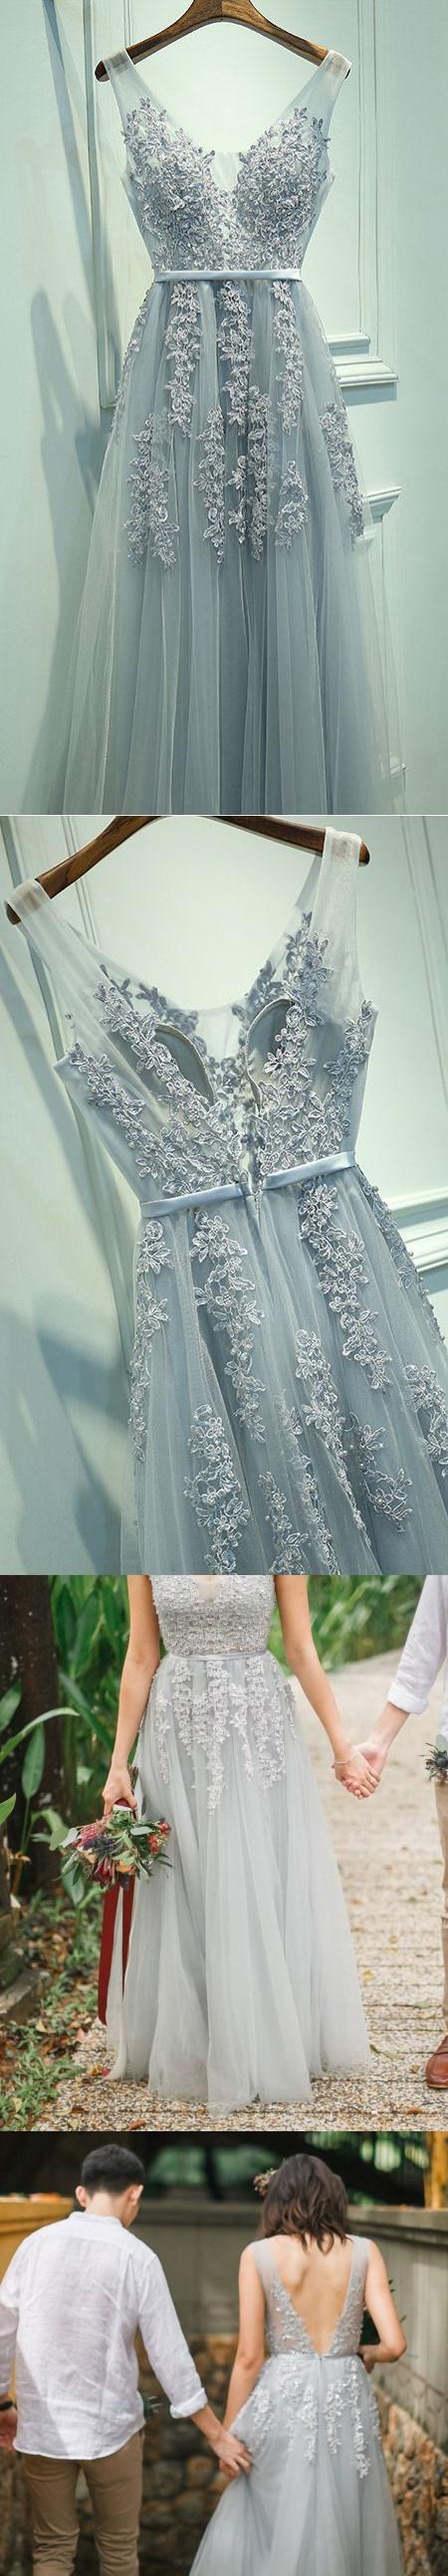 Aline grey tulle with lace appliqued vneck prom dresseslong